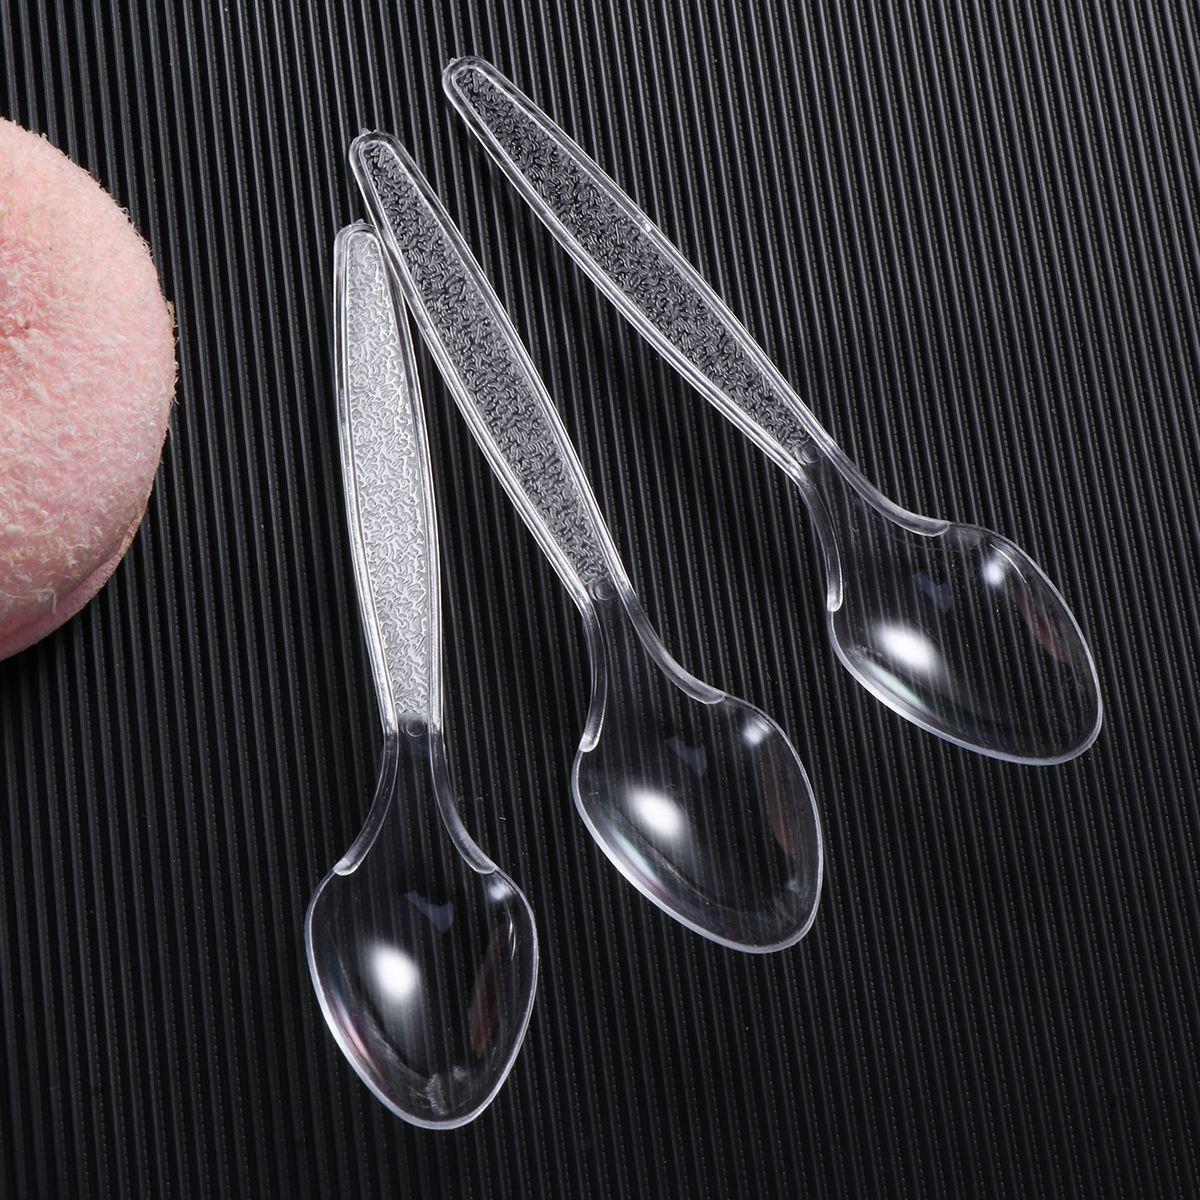 Spoons Disposable Plastic For Fast-Food Restaurant Transparent Utensils